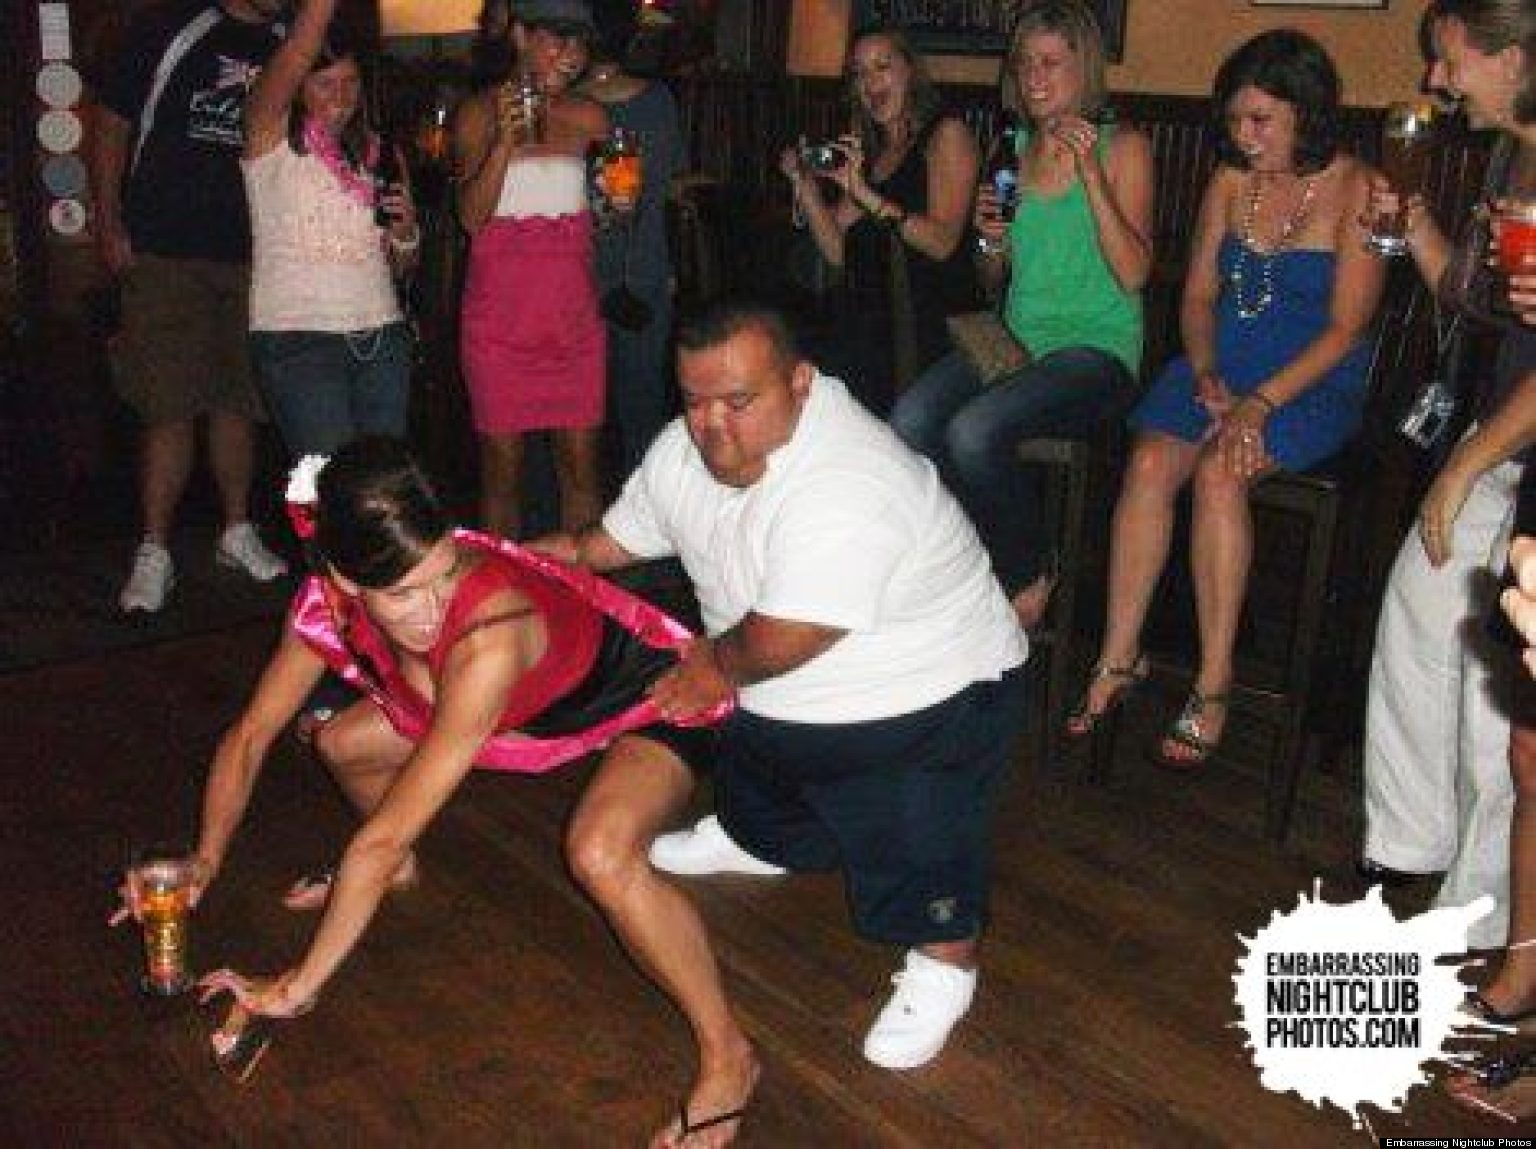 Nights Club Dancing Tumblr